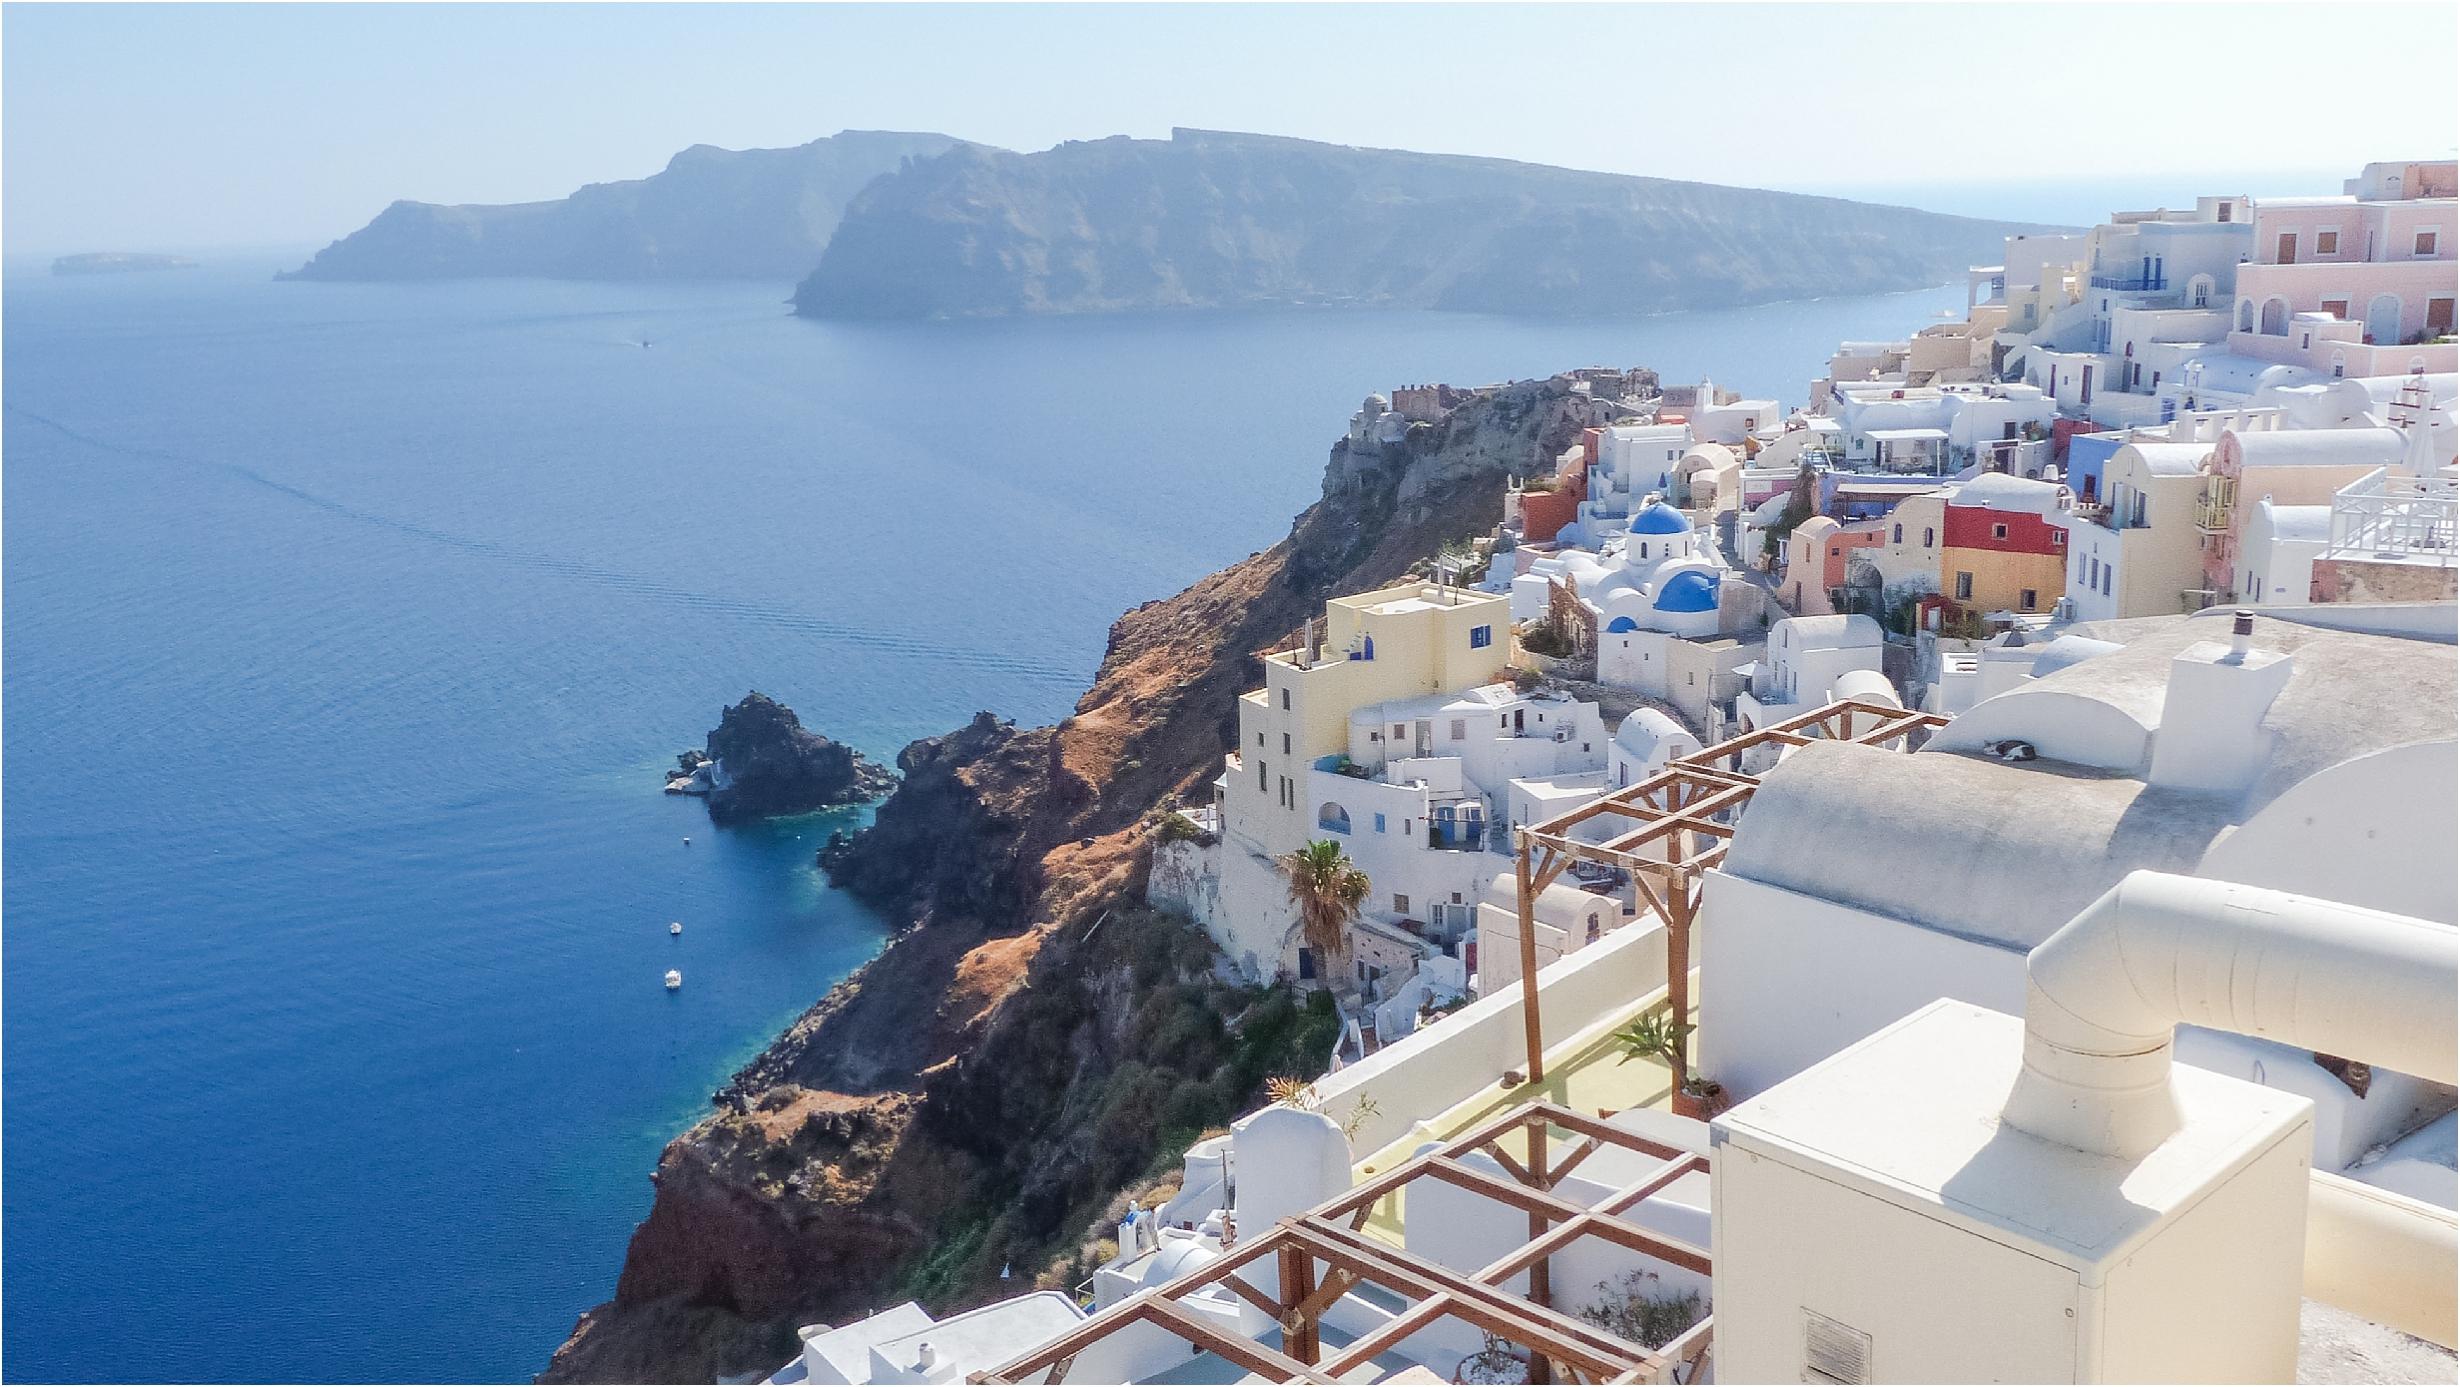 santorini-greece-wedding-photos-in-oia-destination-wedding-photographer-by-courtney-carolyn-photography_0001.jpg